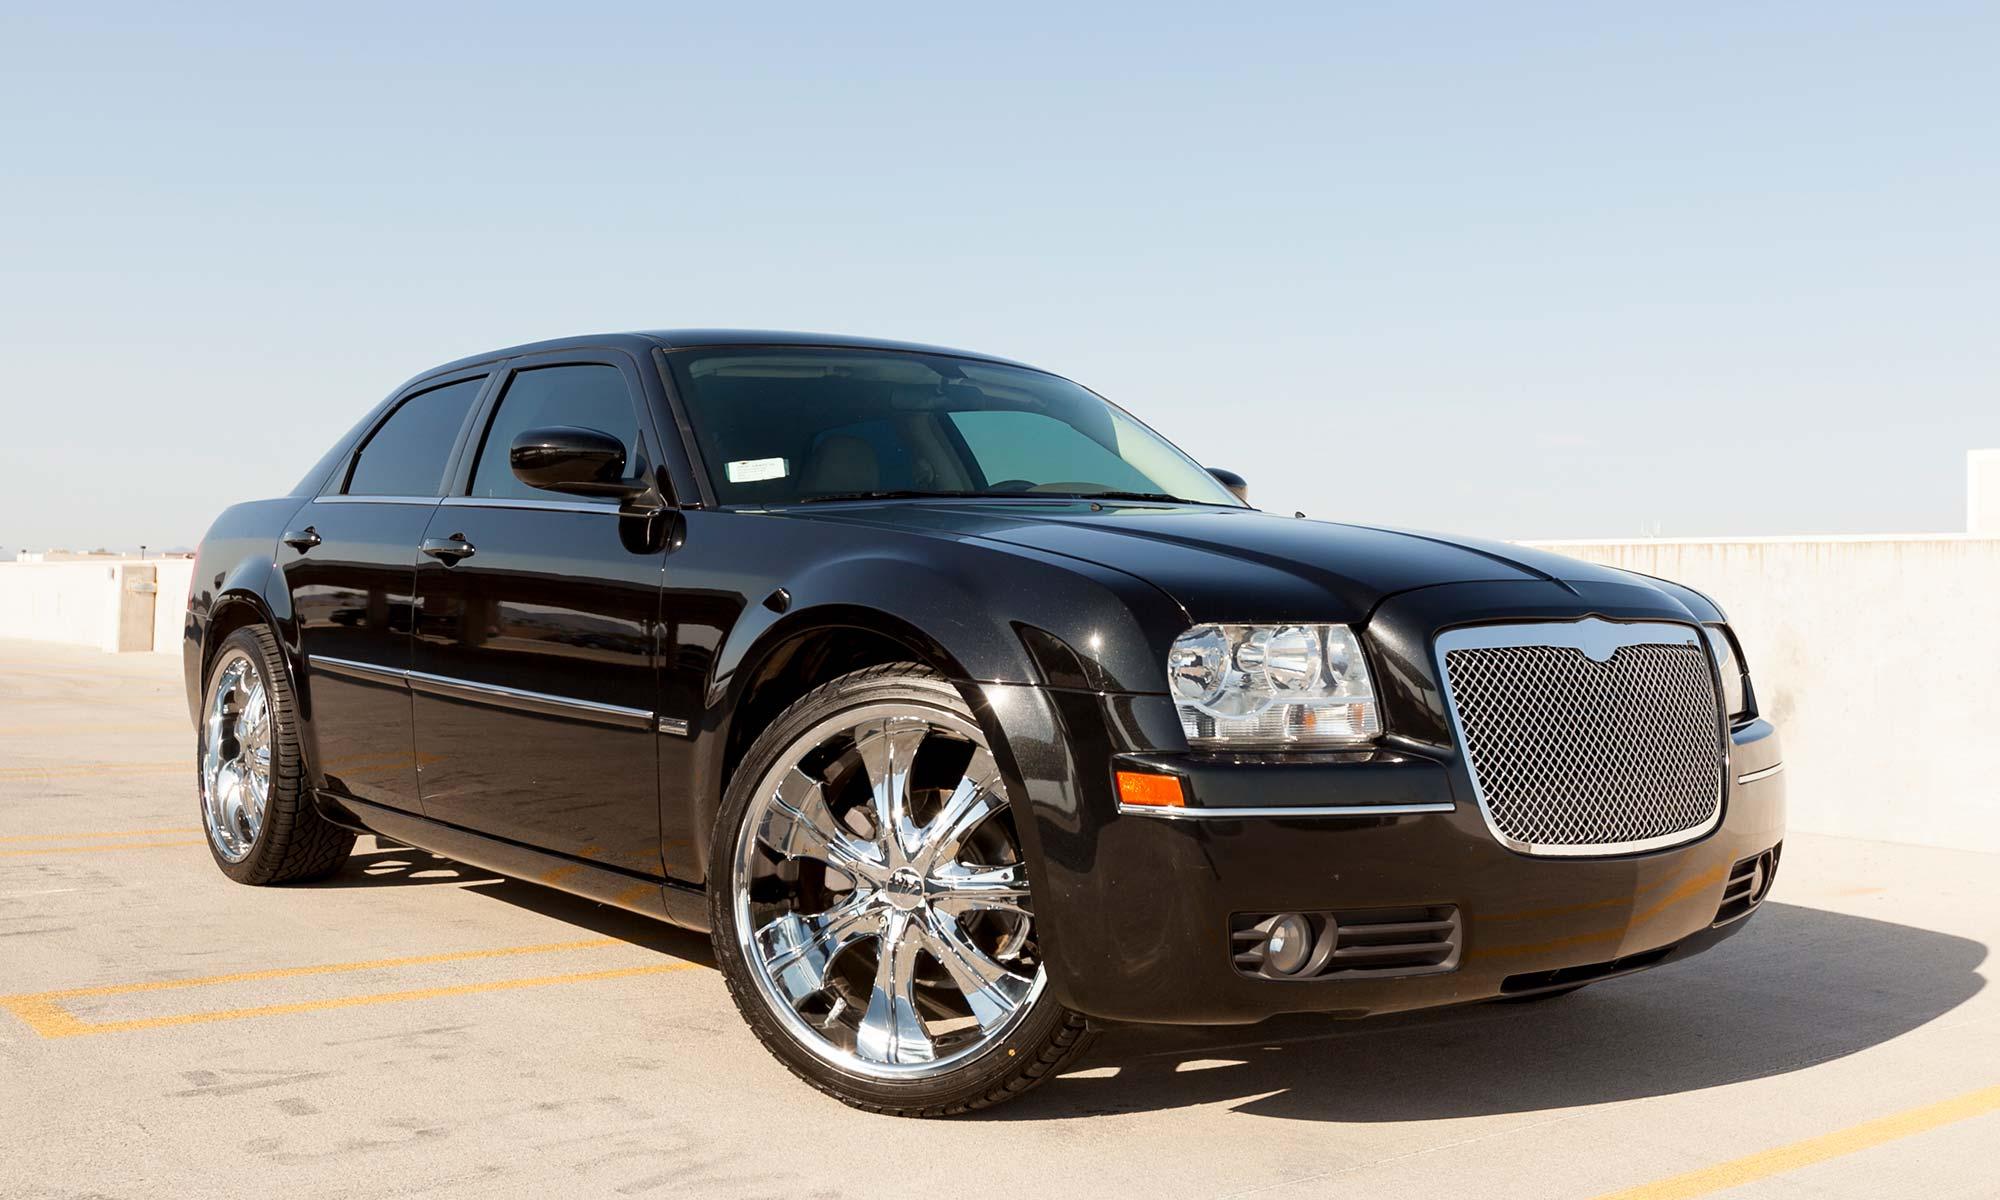 A black Chrysler 300.